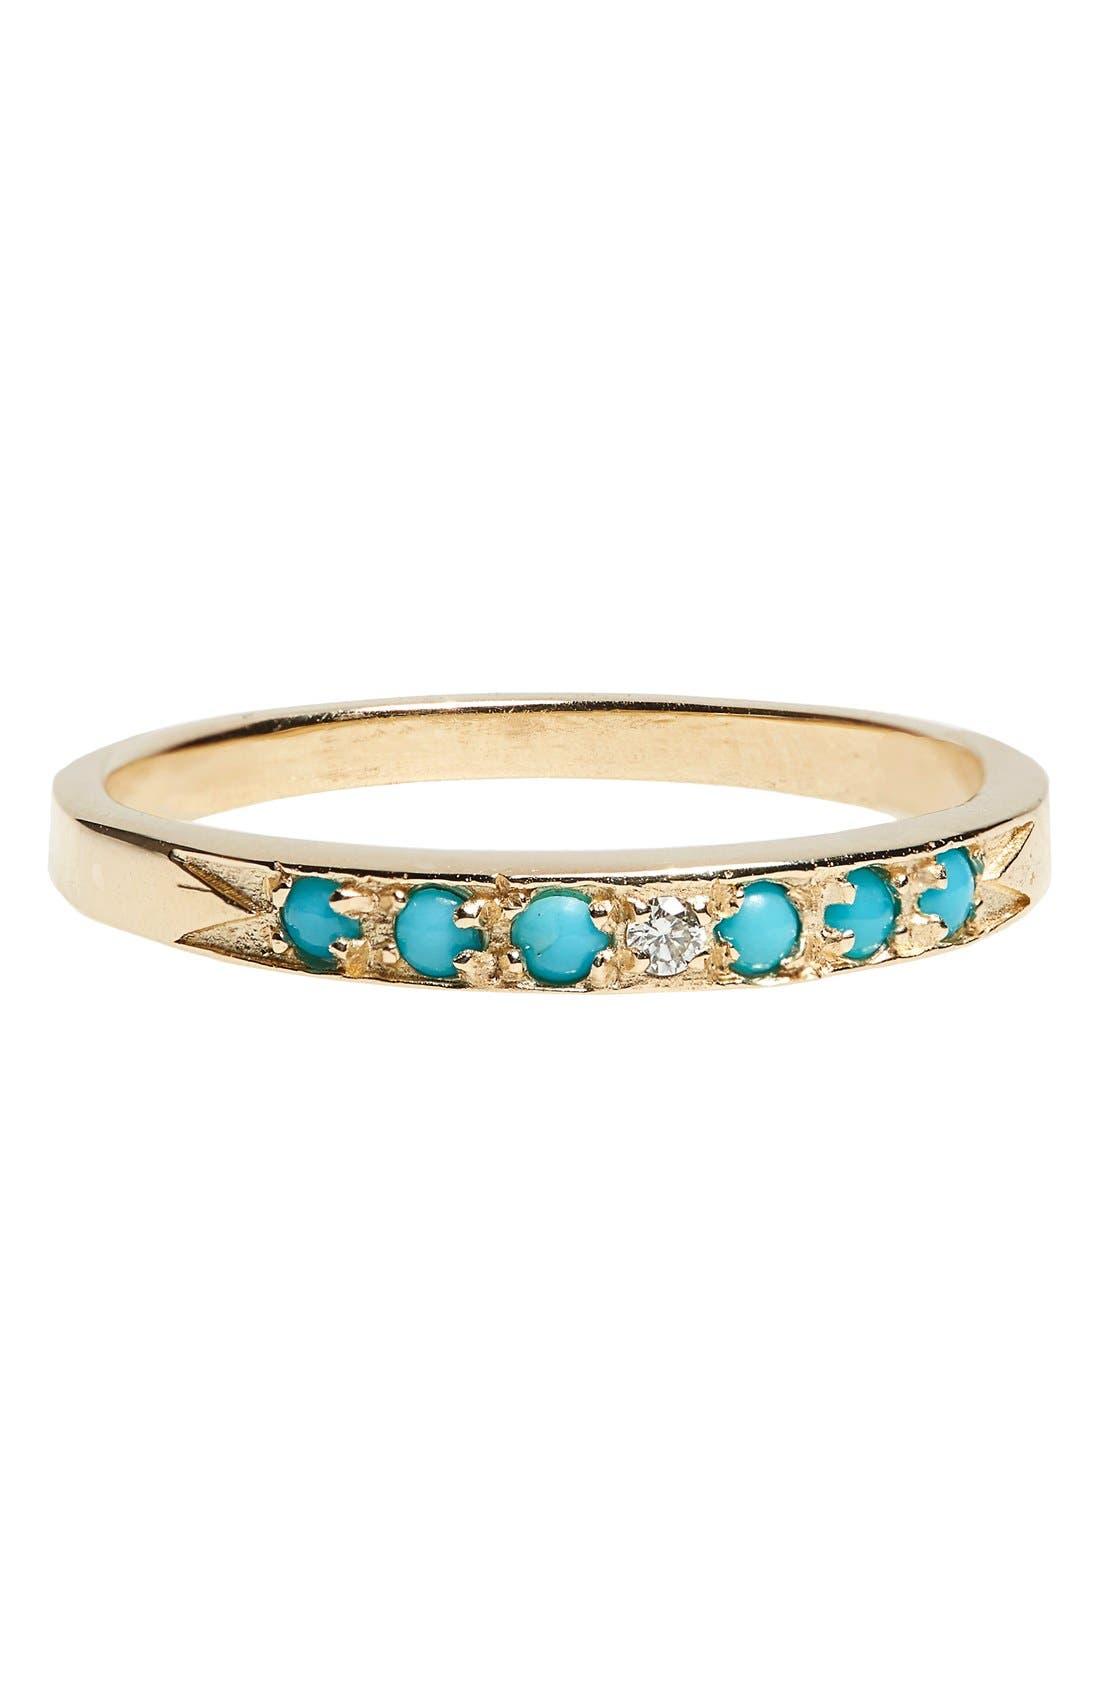 'Moon & Stars' Single Band Turquoise & Diamond Ring,                             Main thumbnail 1, color,                             Yellow Gold